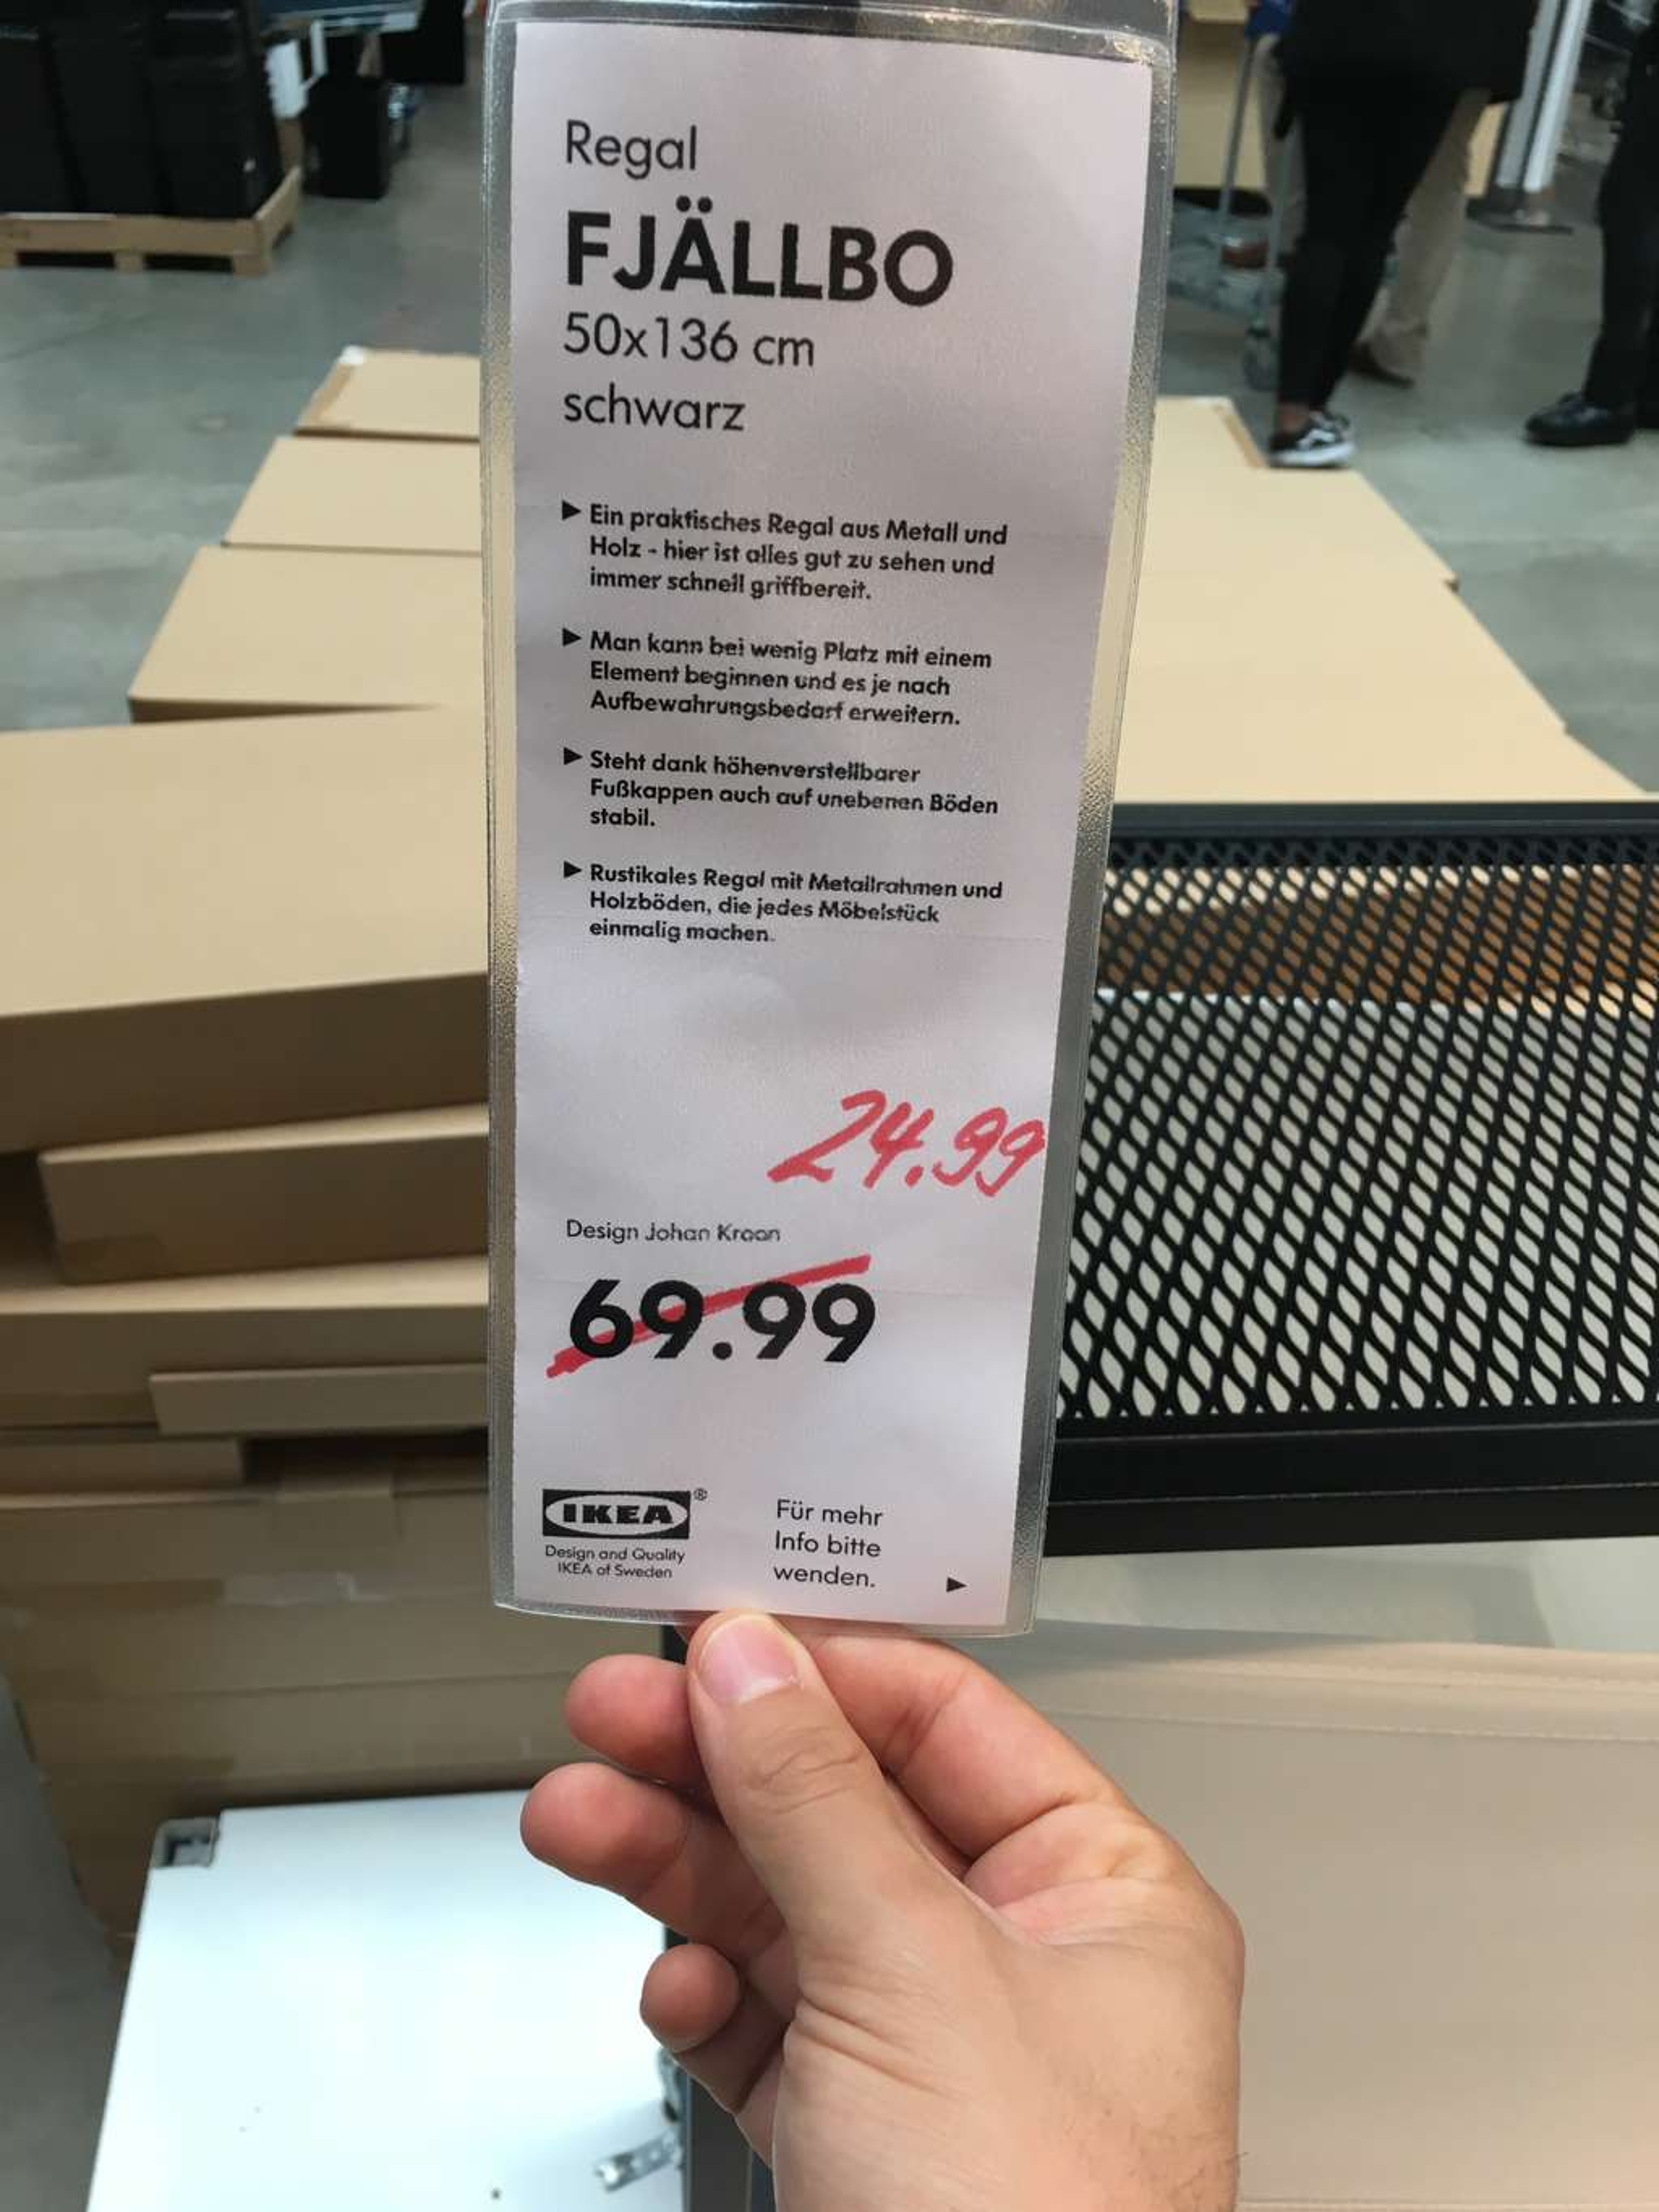 Lokal Ikea Tempelhof Fjallbo Regale Mydealz De